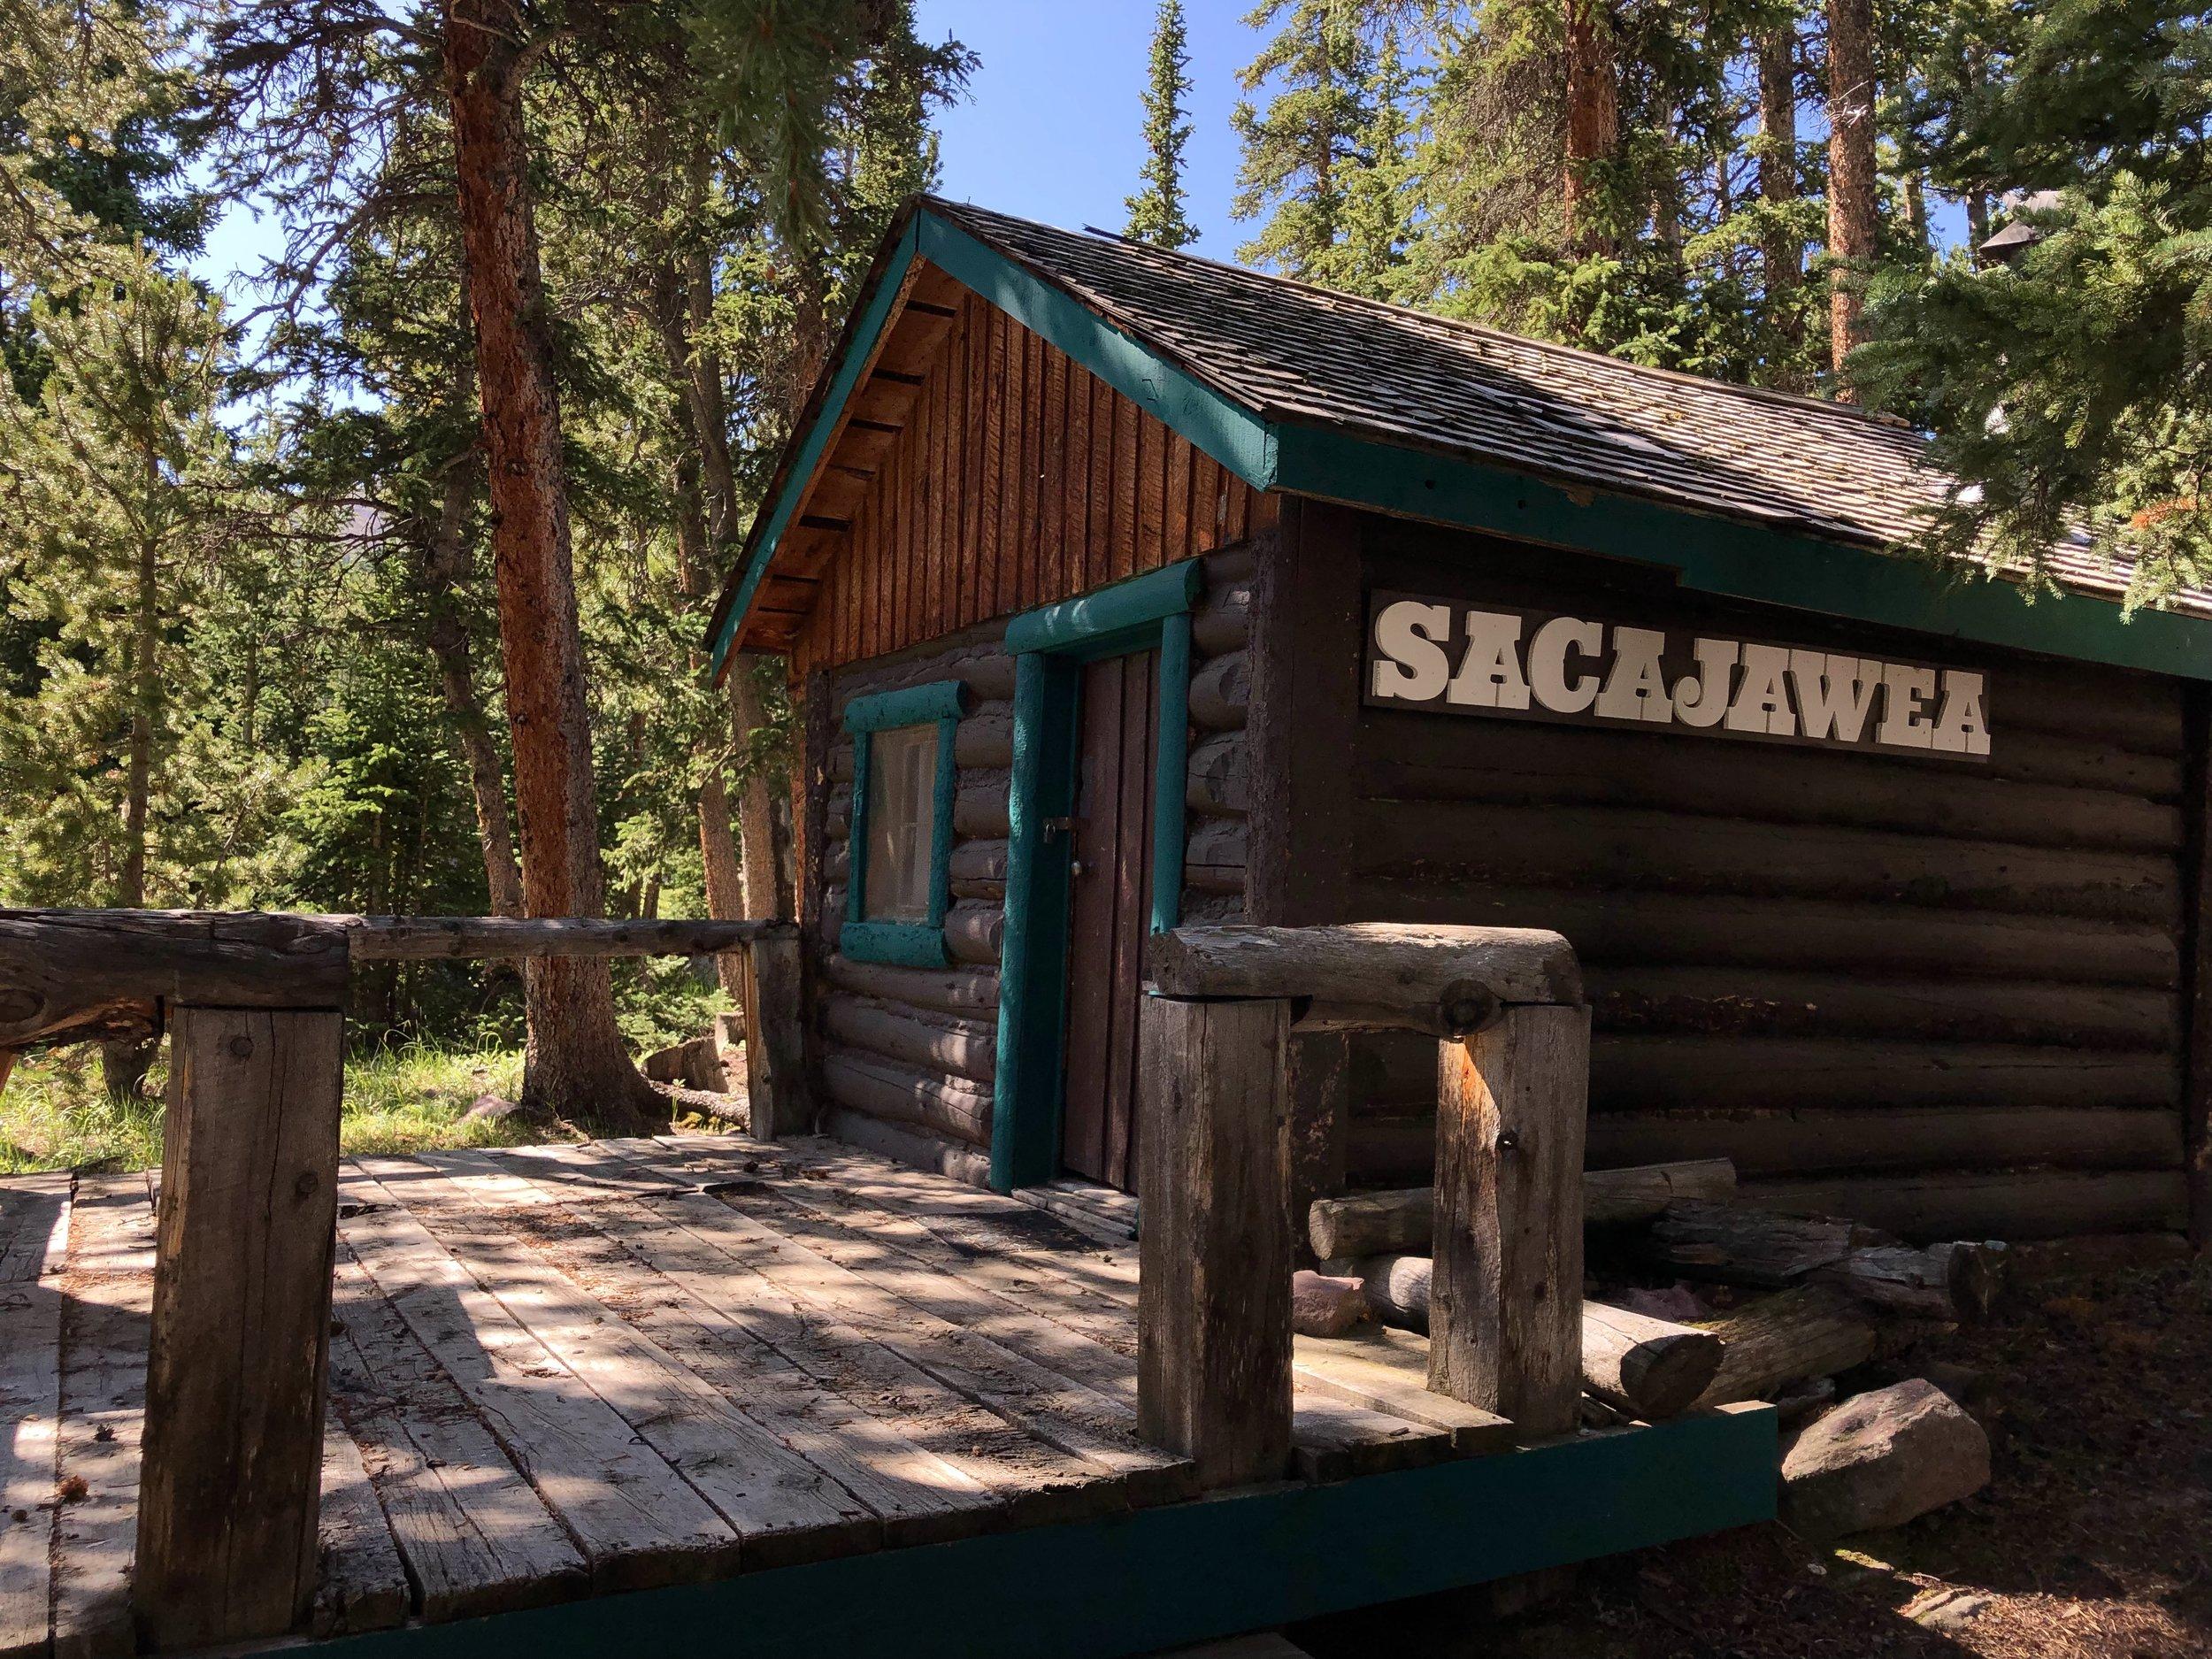 Sacagawea - Sleeps 2 - 120 sq/ft CabinSingle Queen BedPricingSunday - Thursday | $70/NightFriday & Saturday | $85/Night